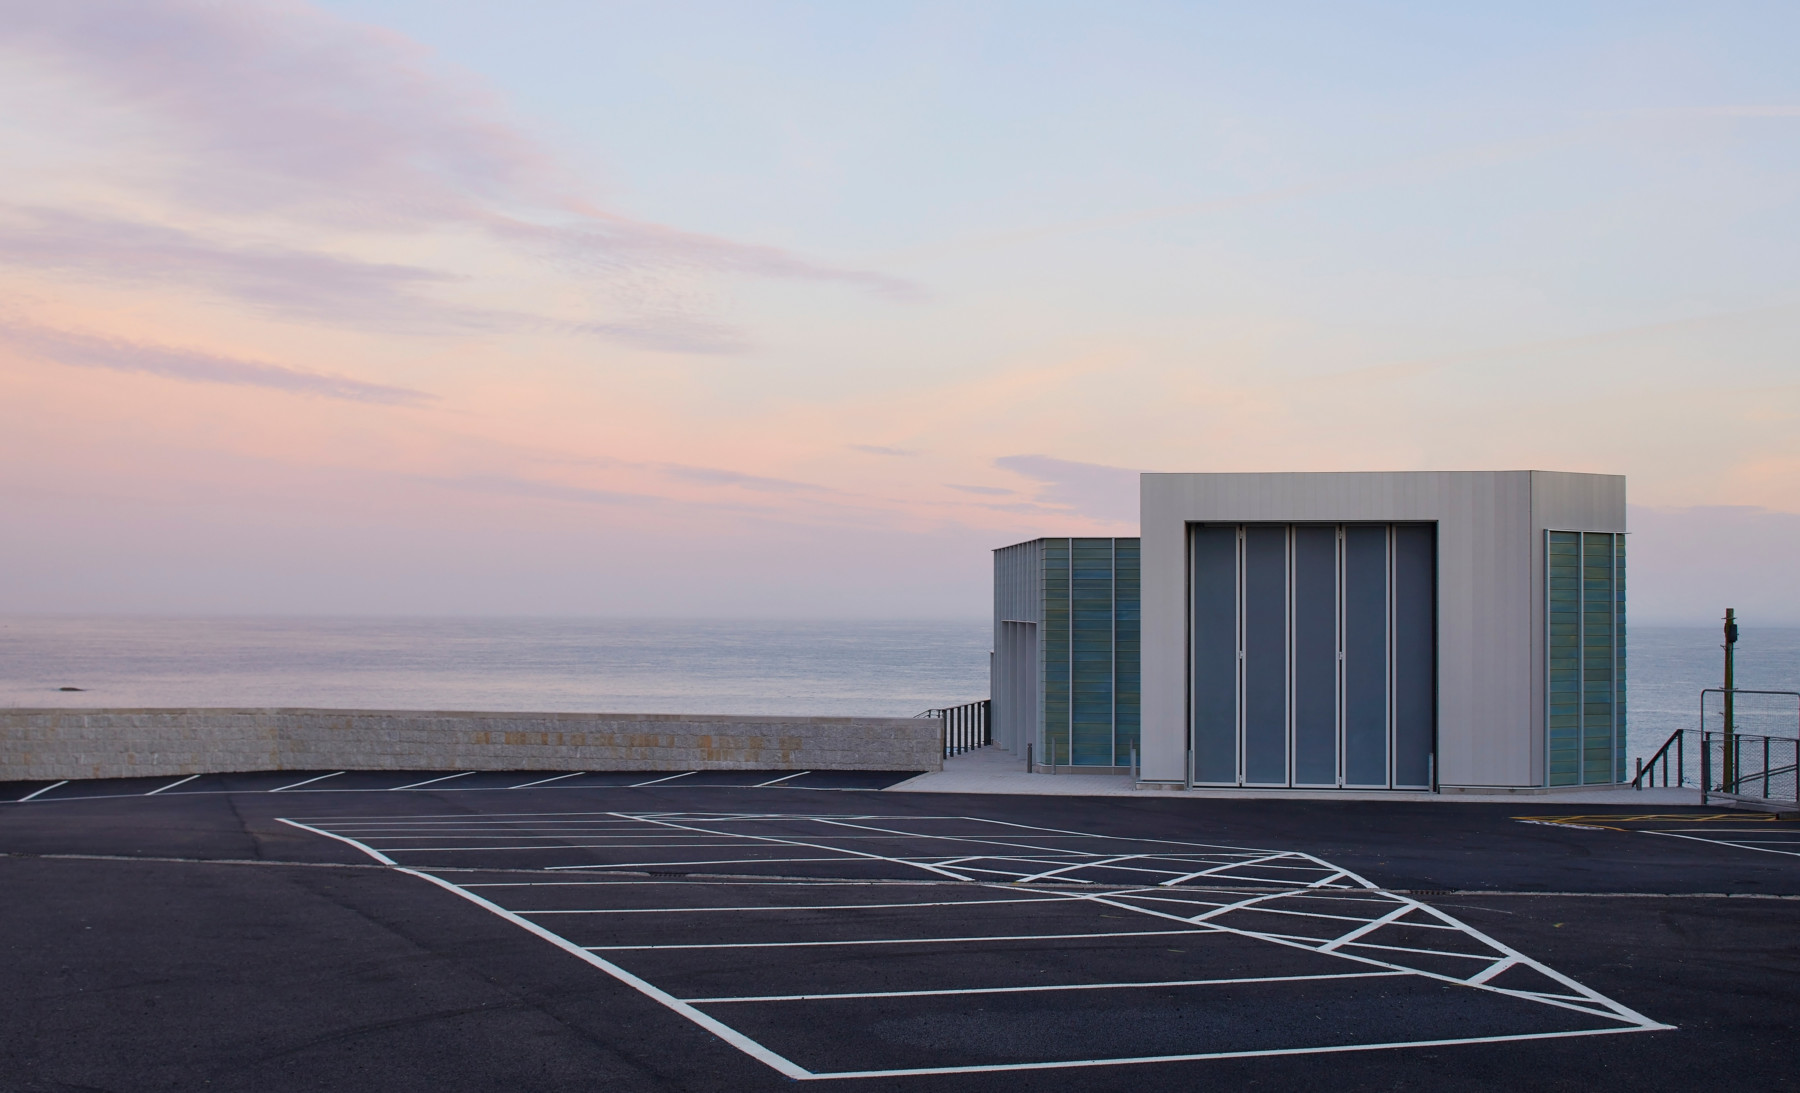 Jamie-fobert-architects-tate-st-ives-ceramic-leech-beach-cornwall-sky-Hufton-Crow